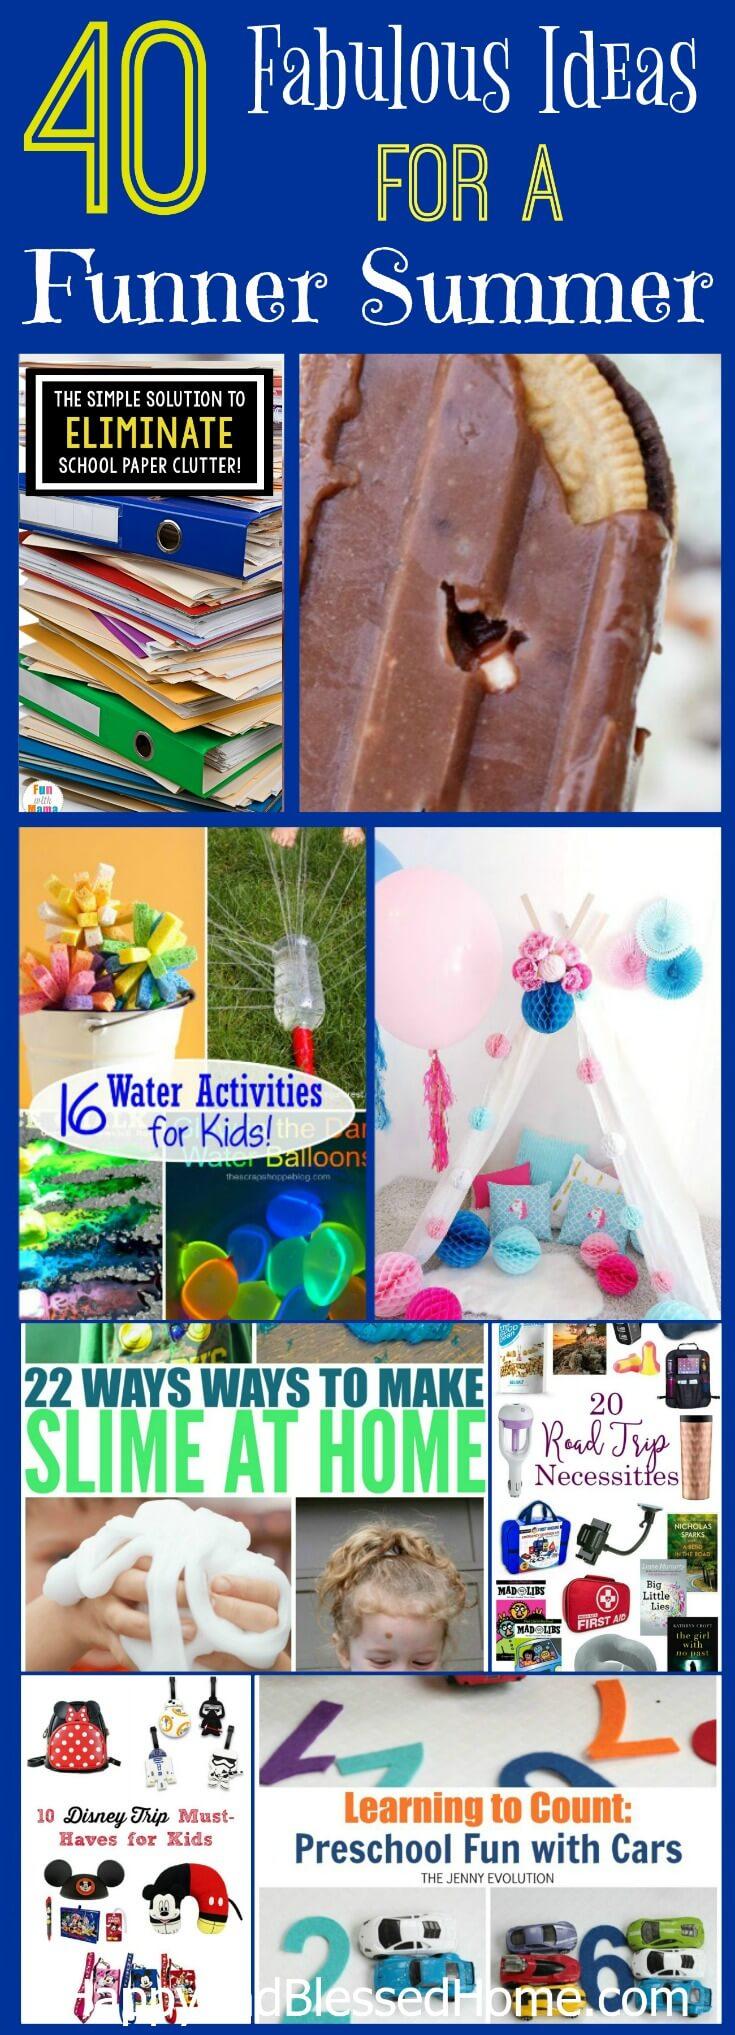 37 Ways To Savor Your Summer: Over 40 Ways To Enjoy Summer Family Fun